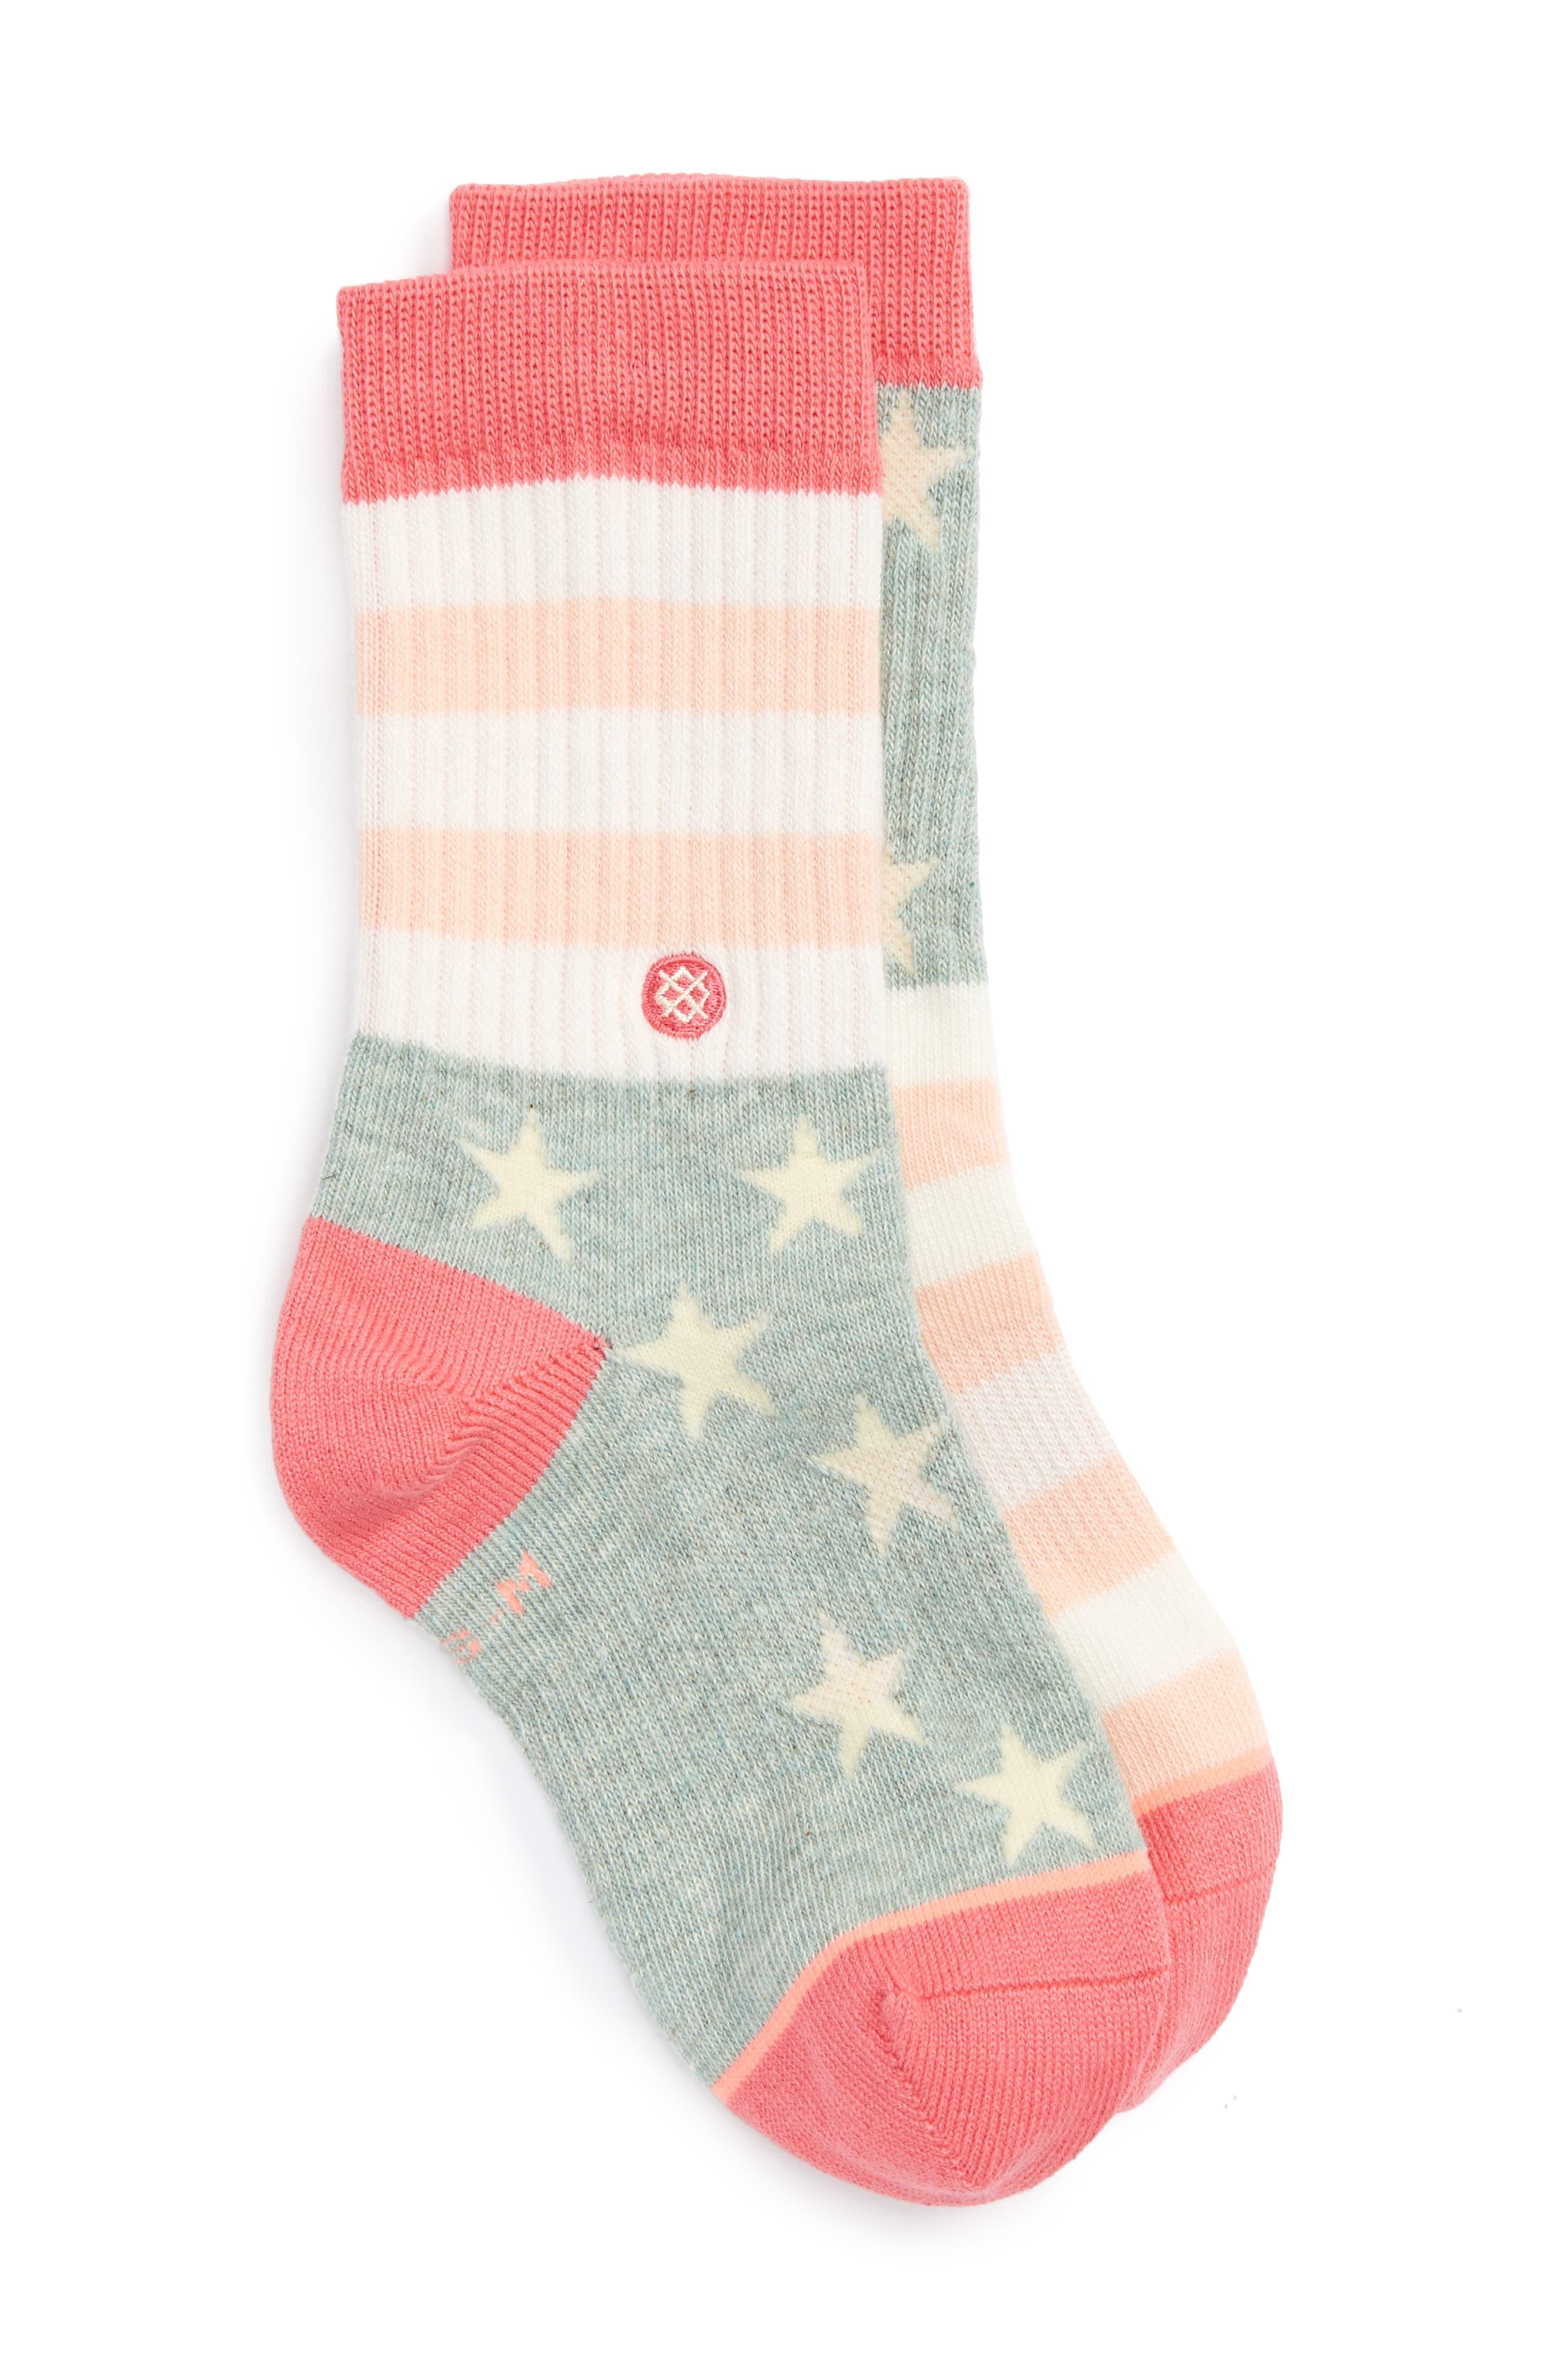 Liberty Socks,                             Main thumbnail 1, color,                             Pink Multi